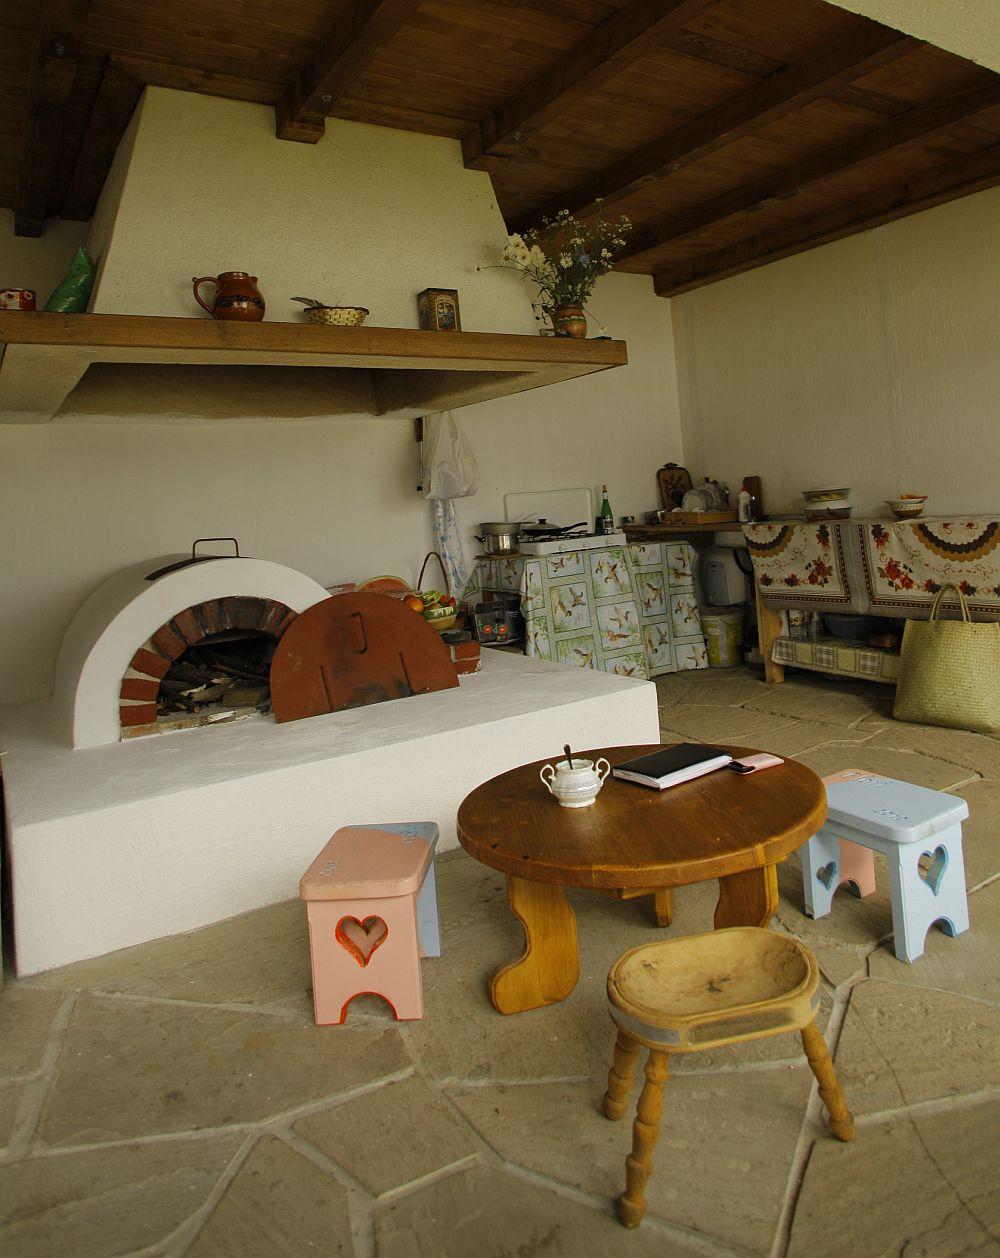 adelaparvu.com despre casa traditionala romaneasca, casa cu arhitectura rustica romaneasca, arh. Doina Petrescu, foto Andrei Baltaretu (32)